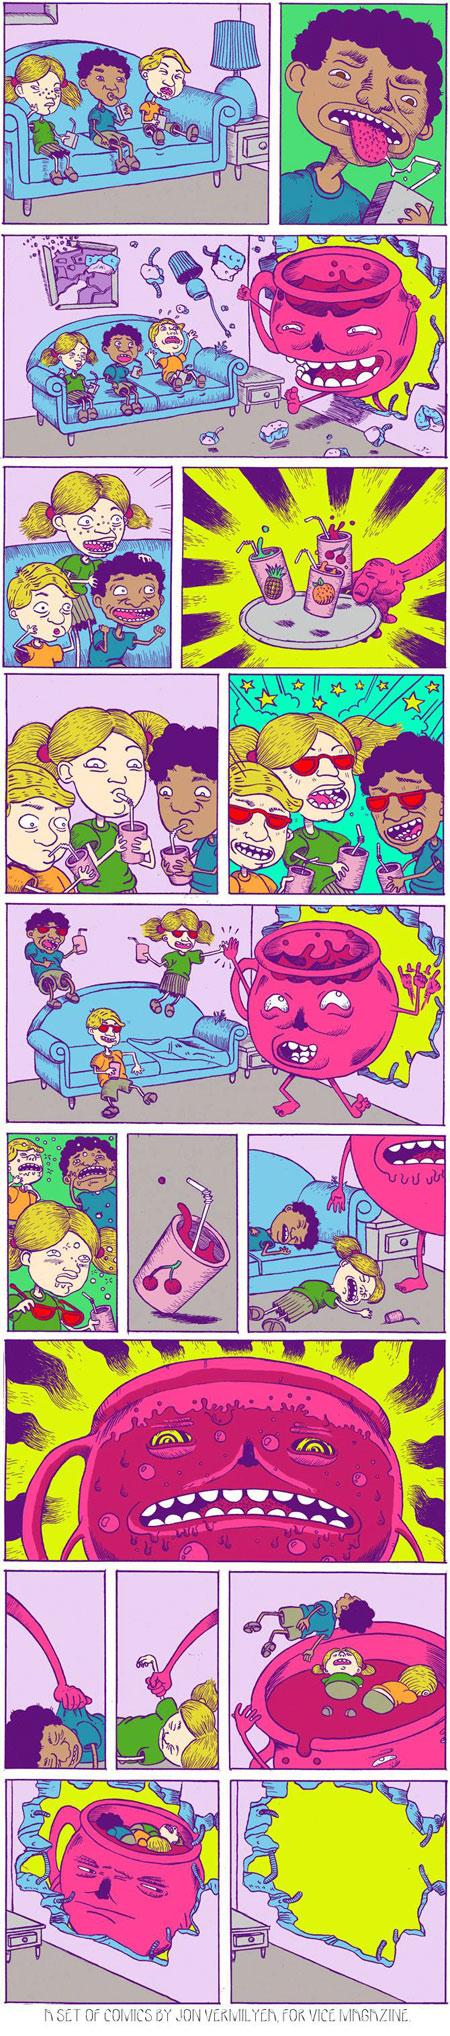 Oh Yeah Oh No Funny Comics Crazy Kids Kool Aid